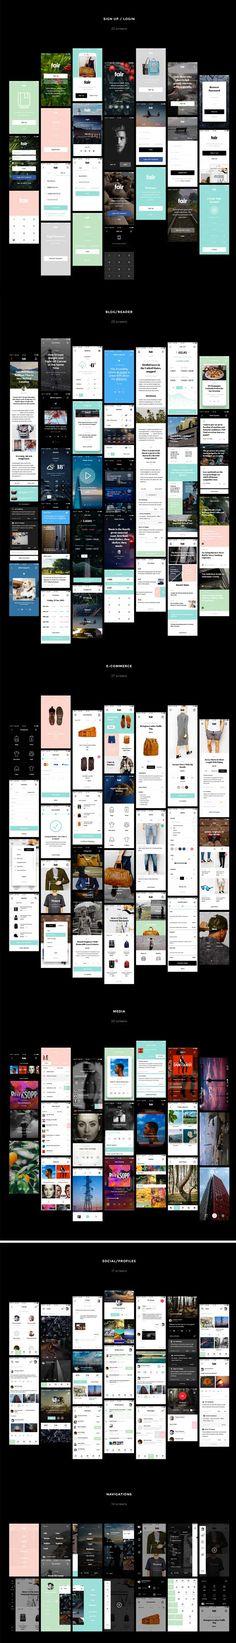 Free Fair Mobile UI Kit PSD Sketch Screens Preview